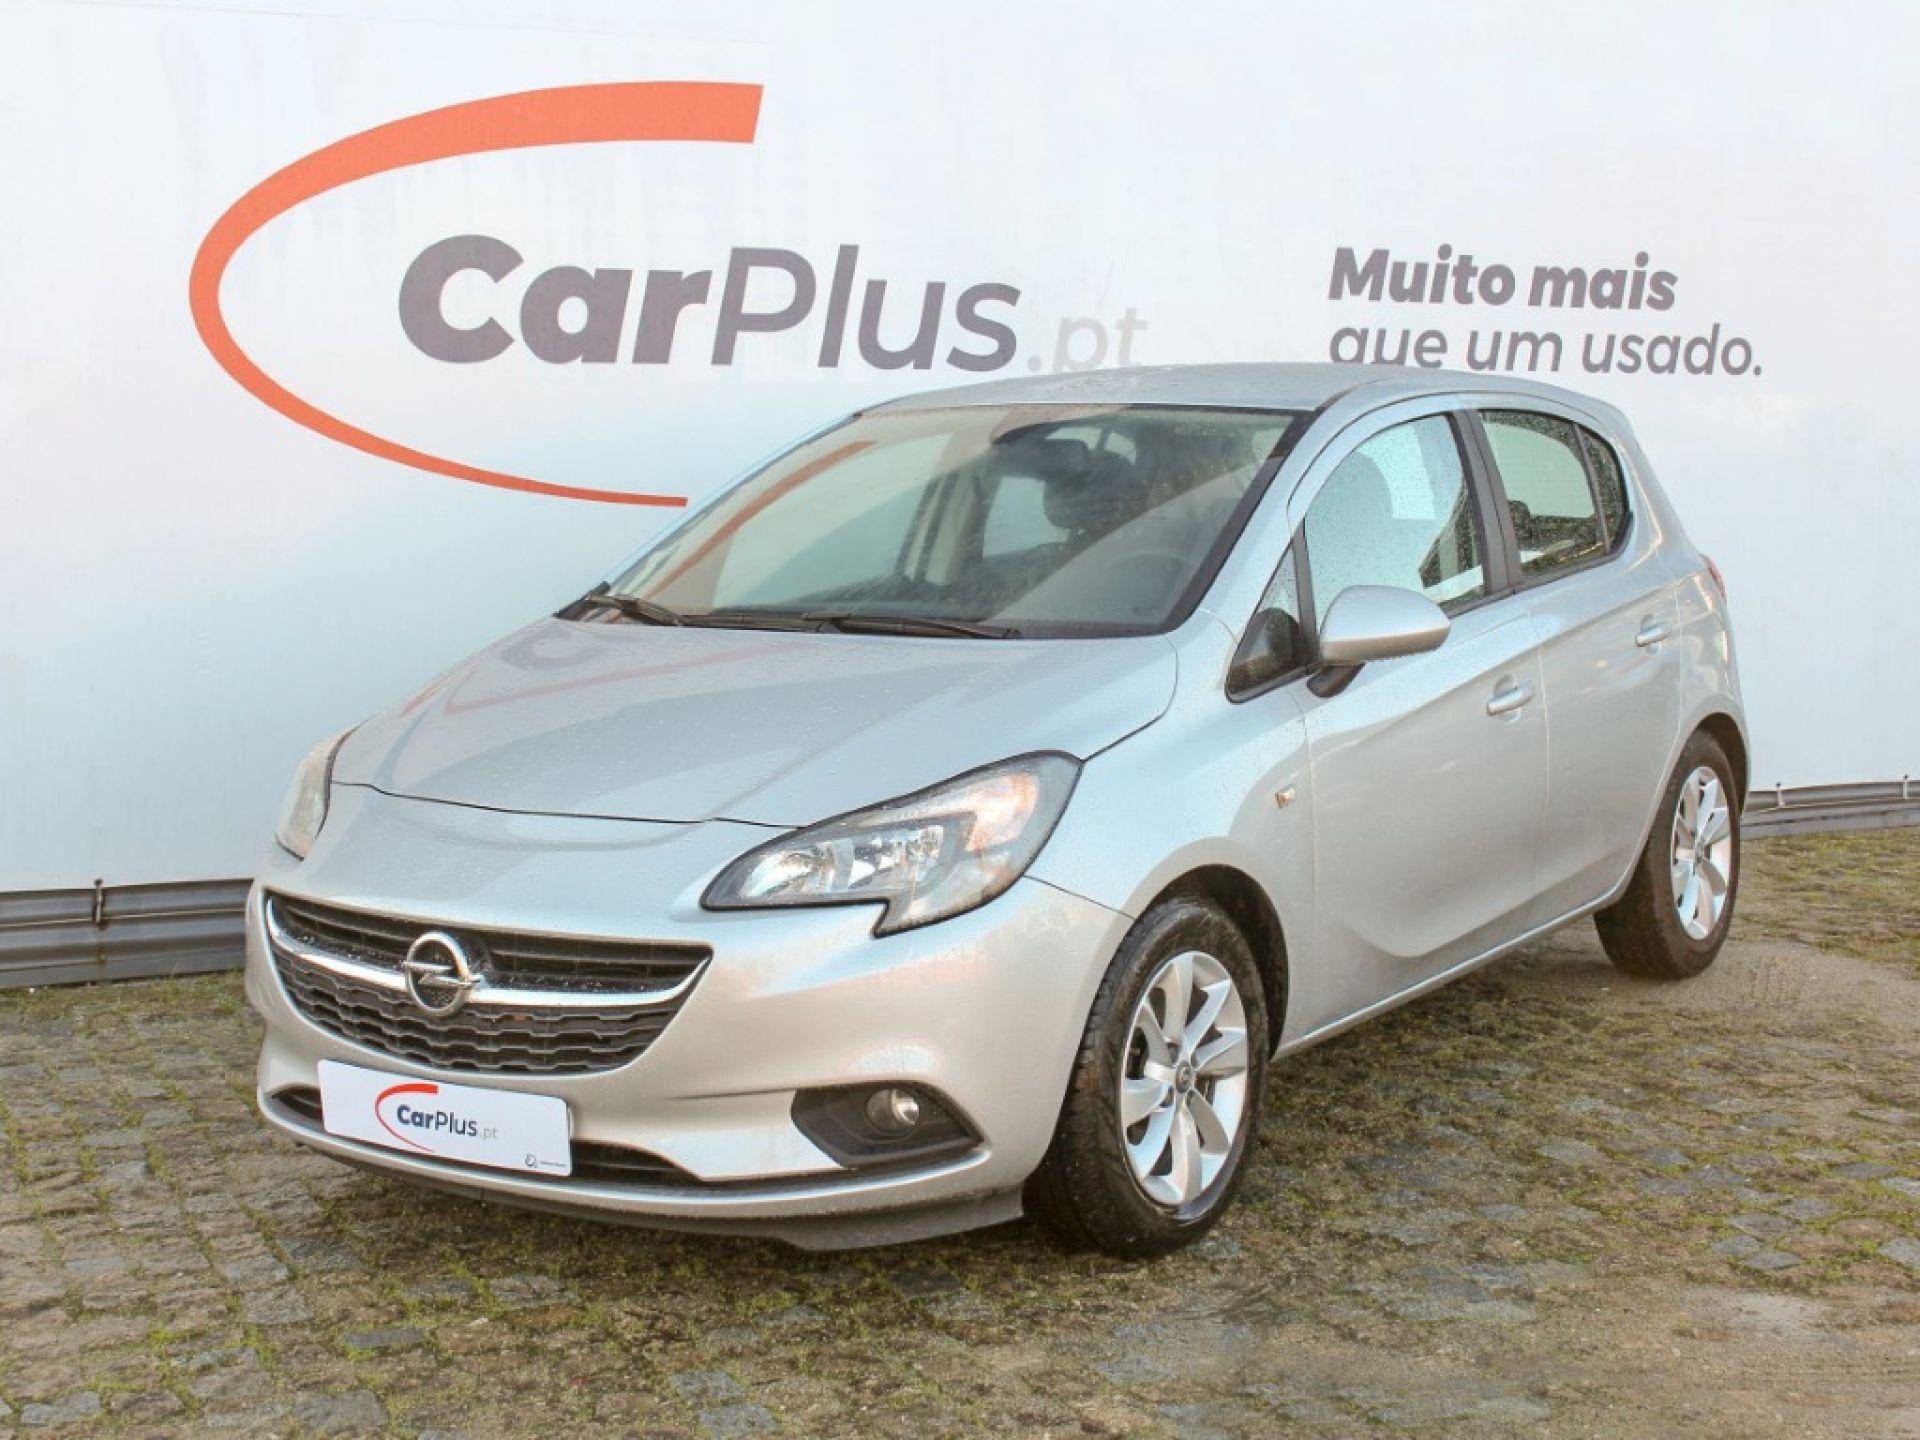 Opel Corsa 1.3 CDTI 95cv S/S Dynamic segunda mão Braga